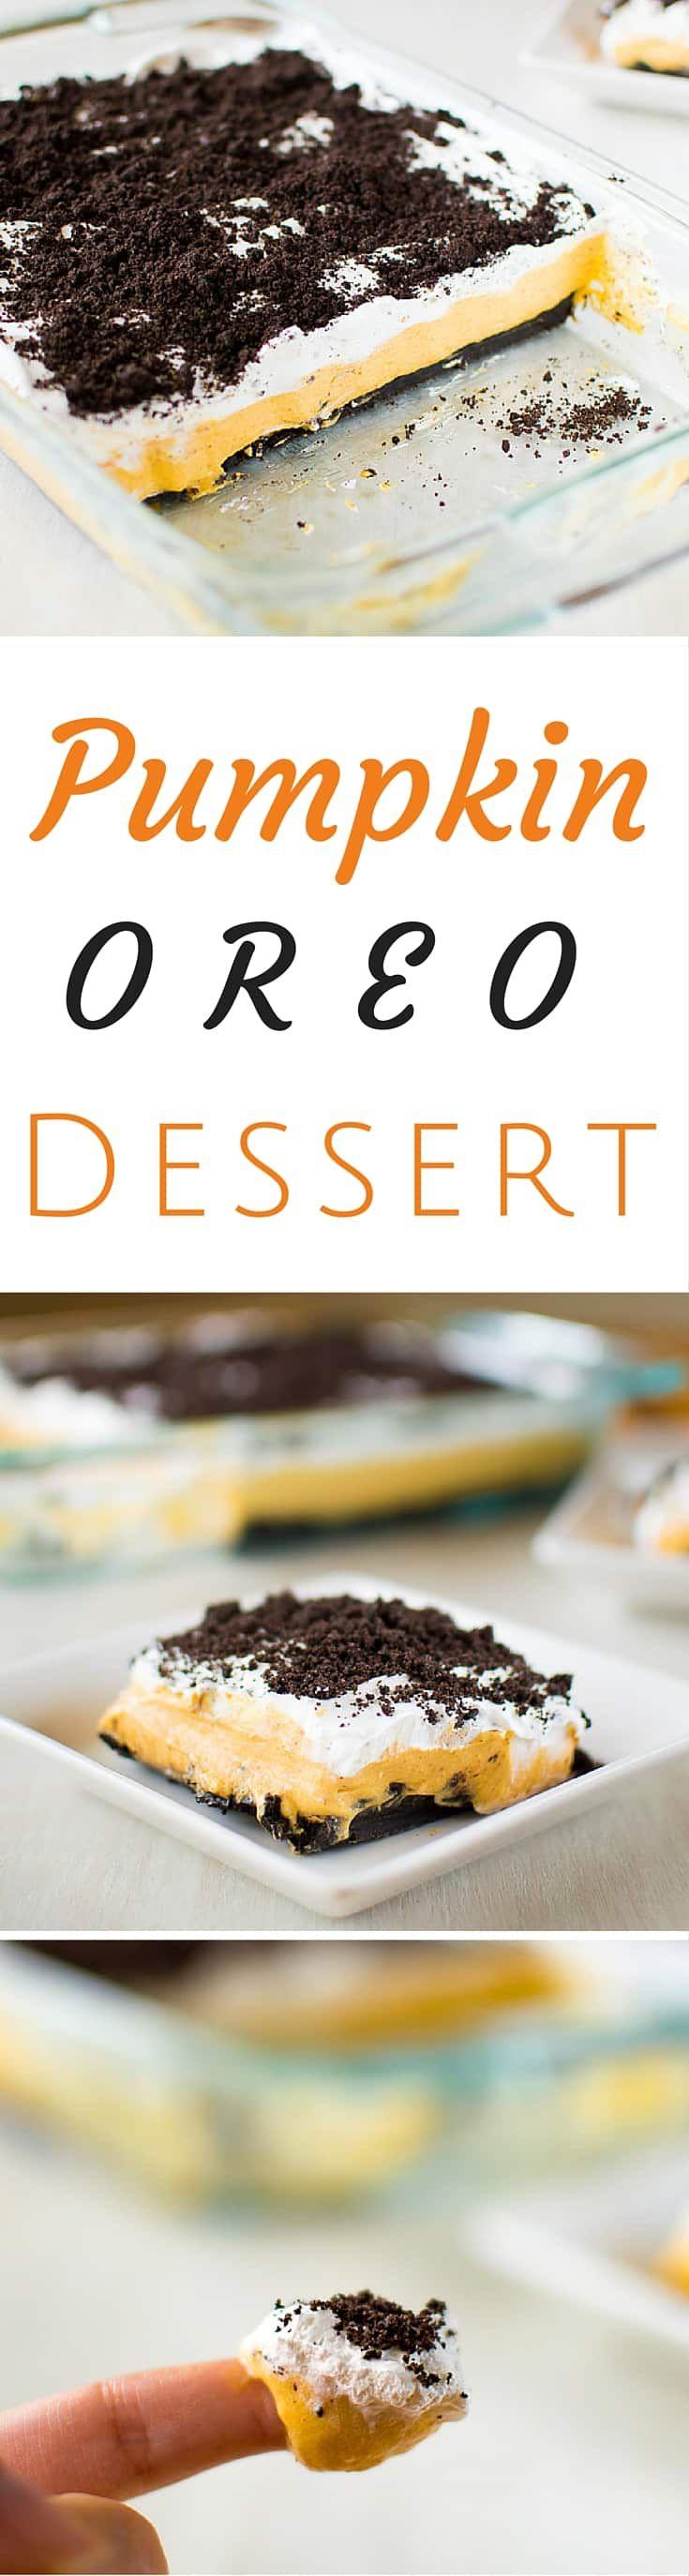 Pumpkin Oreo Delight: aka No-bake Layered Pudding Dessert Lasagna | Kitchen Gidget